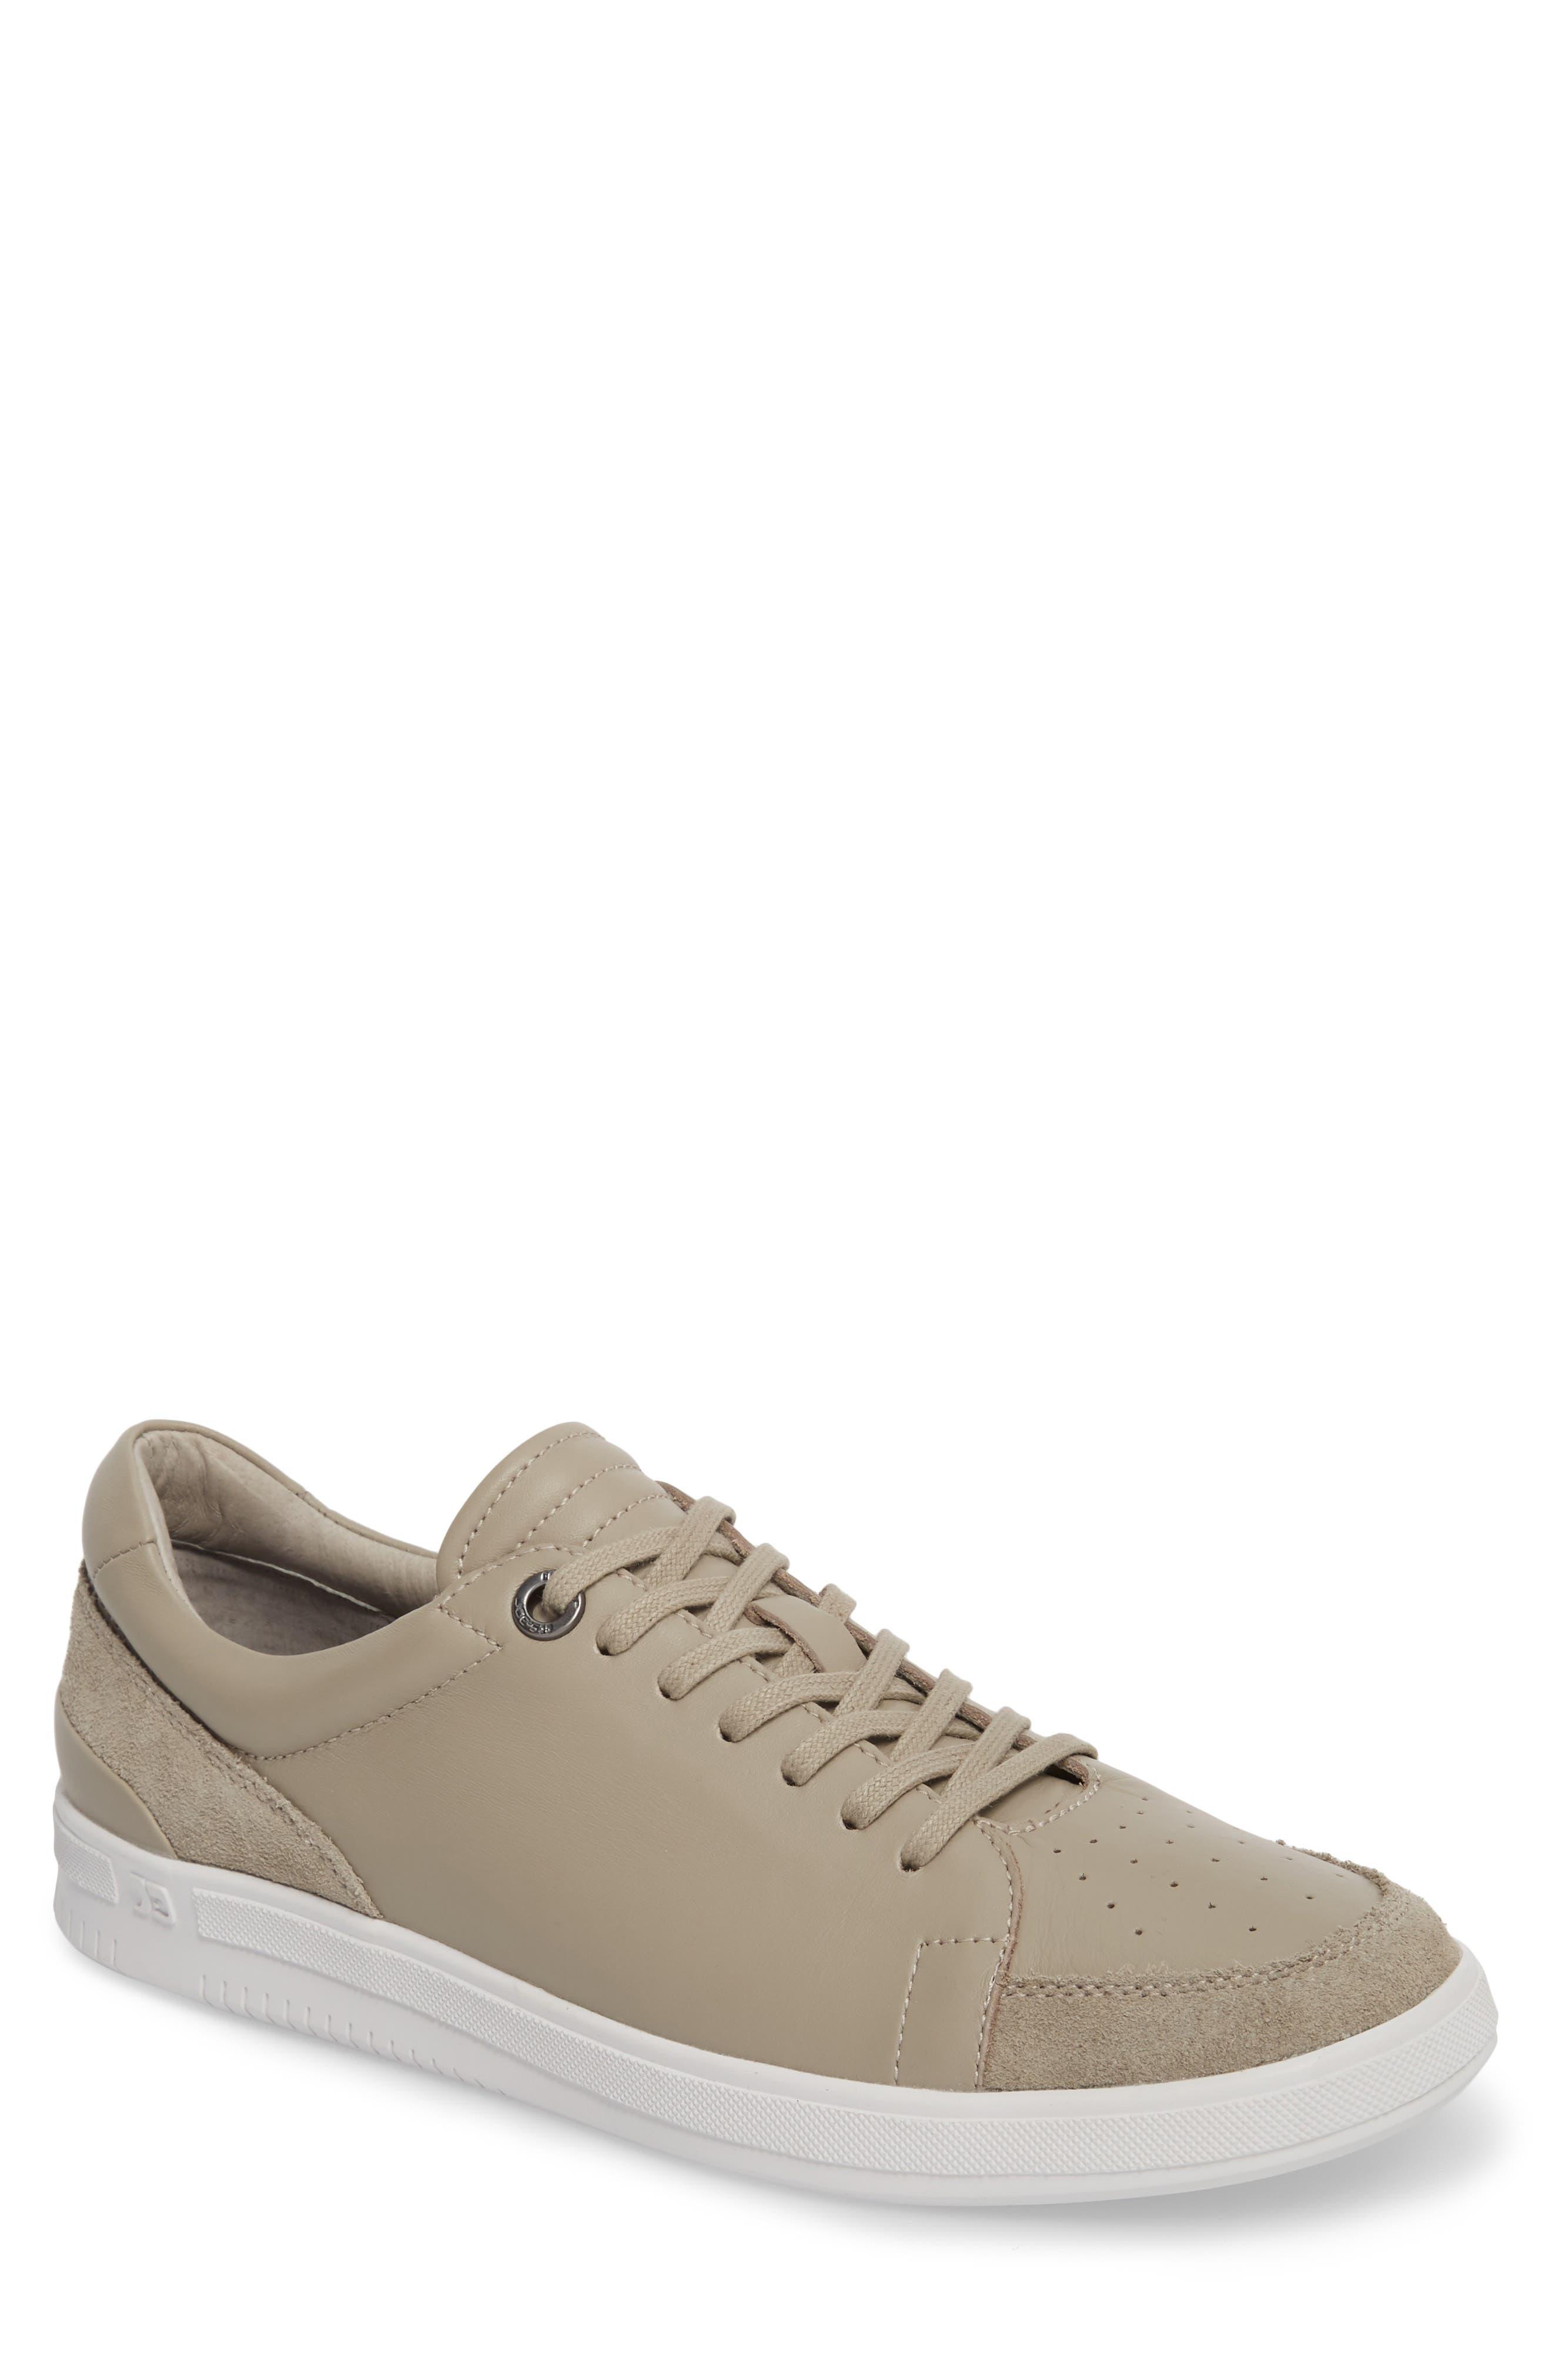 Joe's Joe Classic Low Top Sneaker (Men)